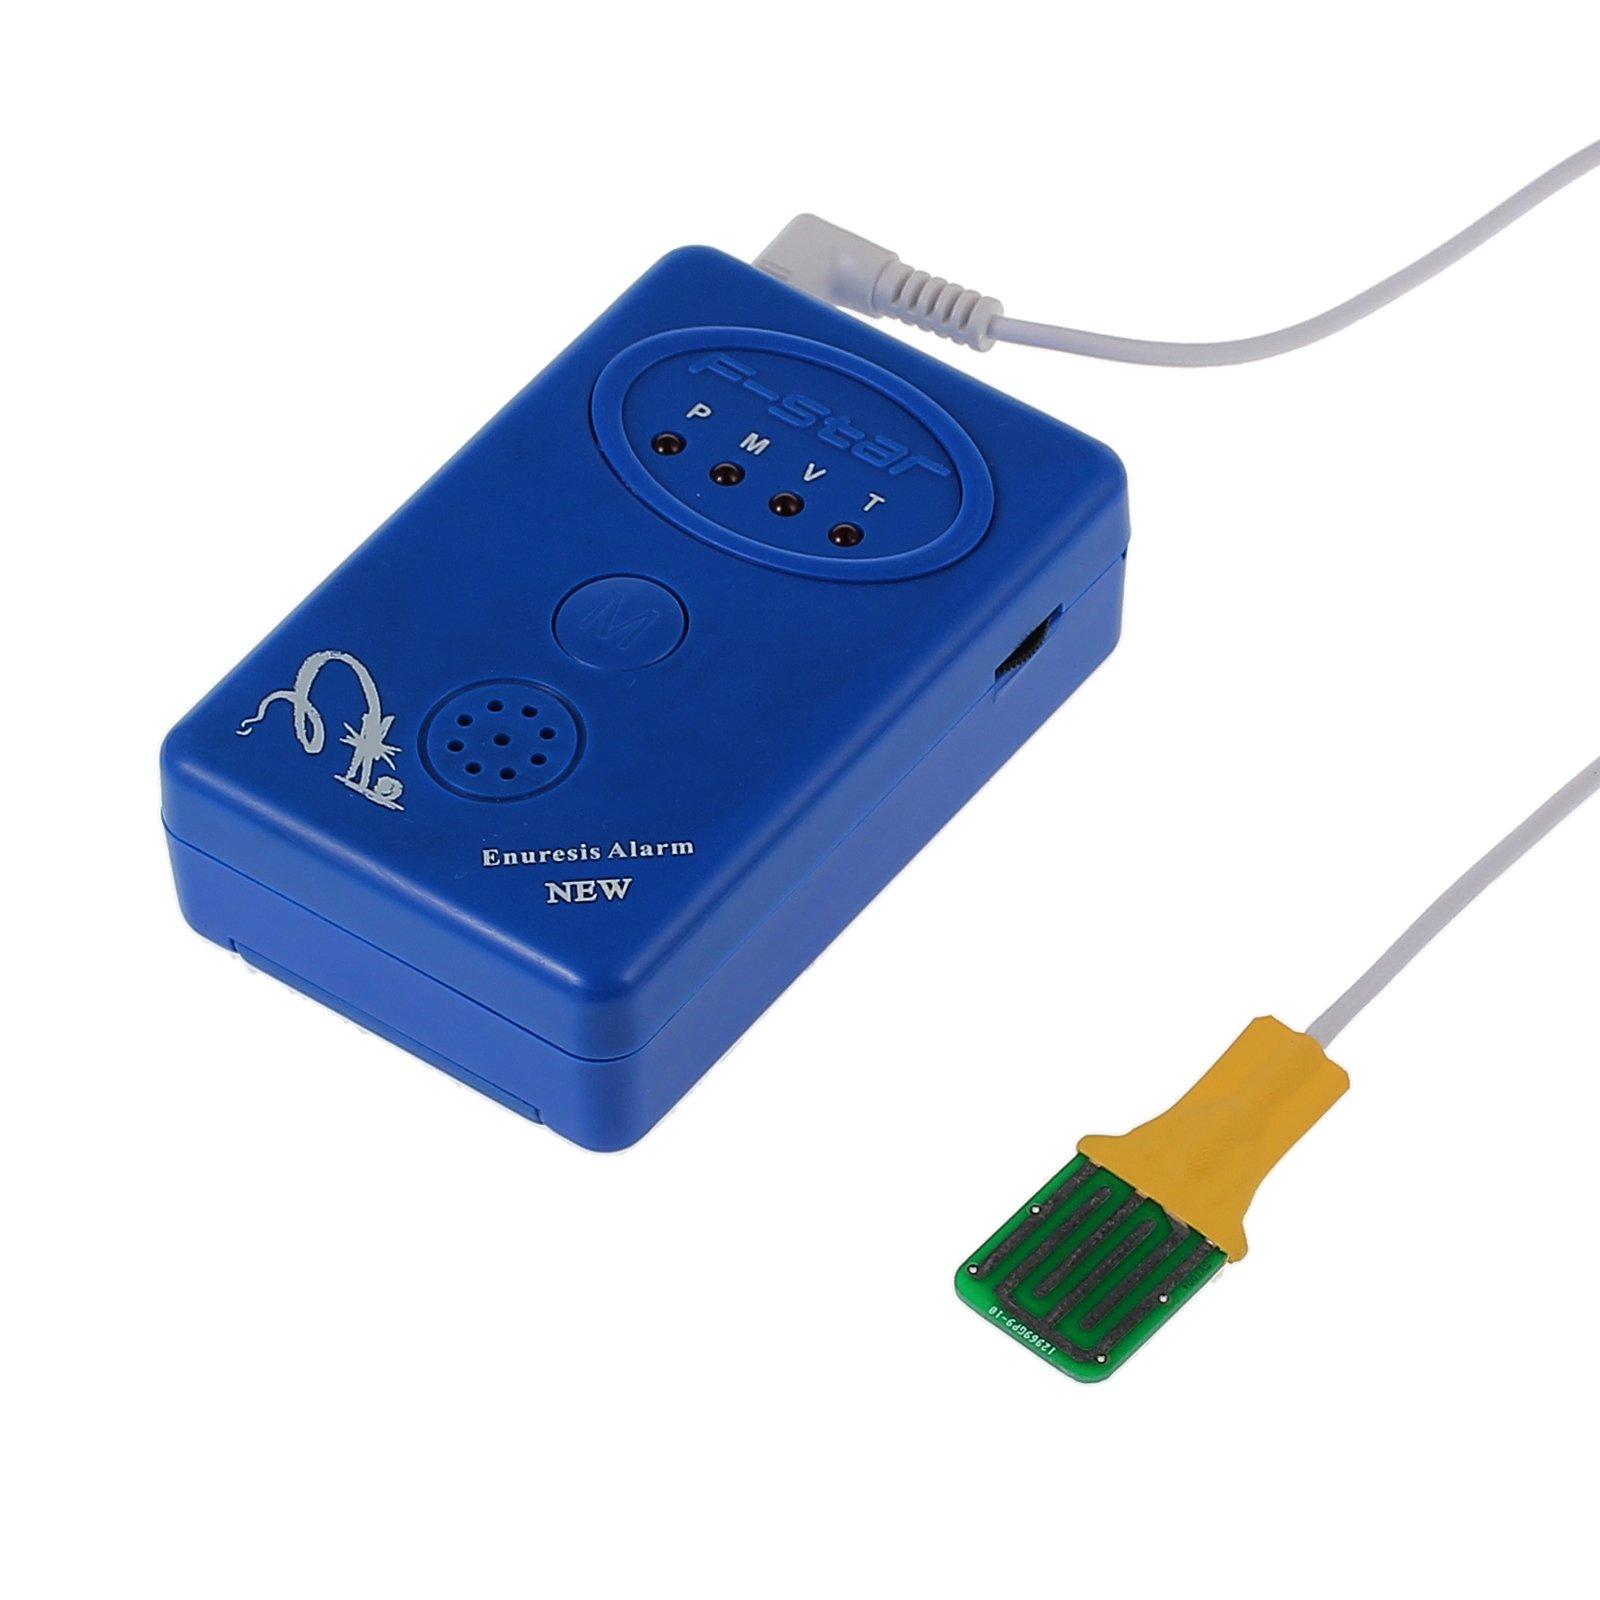 Proster Bedwetting Alarm Bed Wetting Alarm Urine Alert Enuresis Bedwetting Sensor Clamp Probe